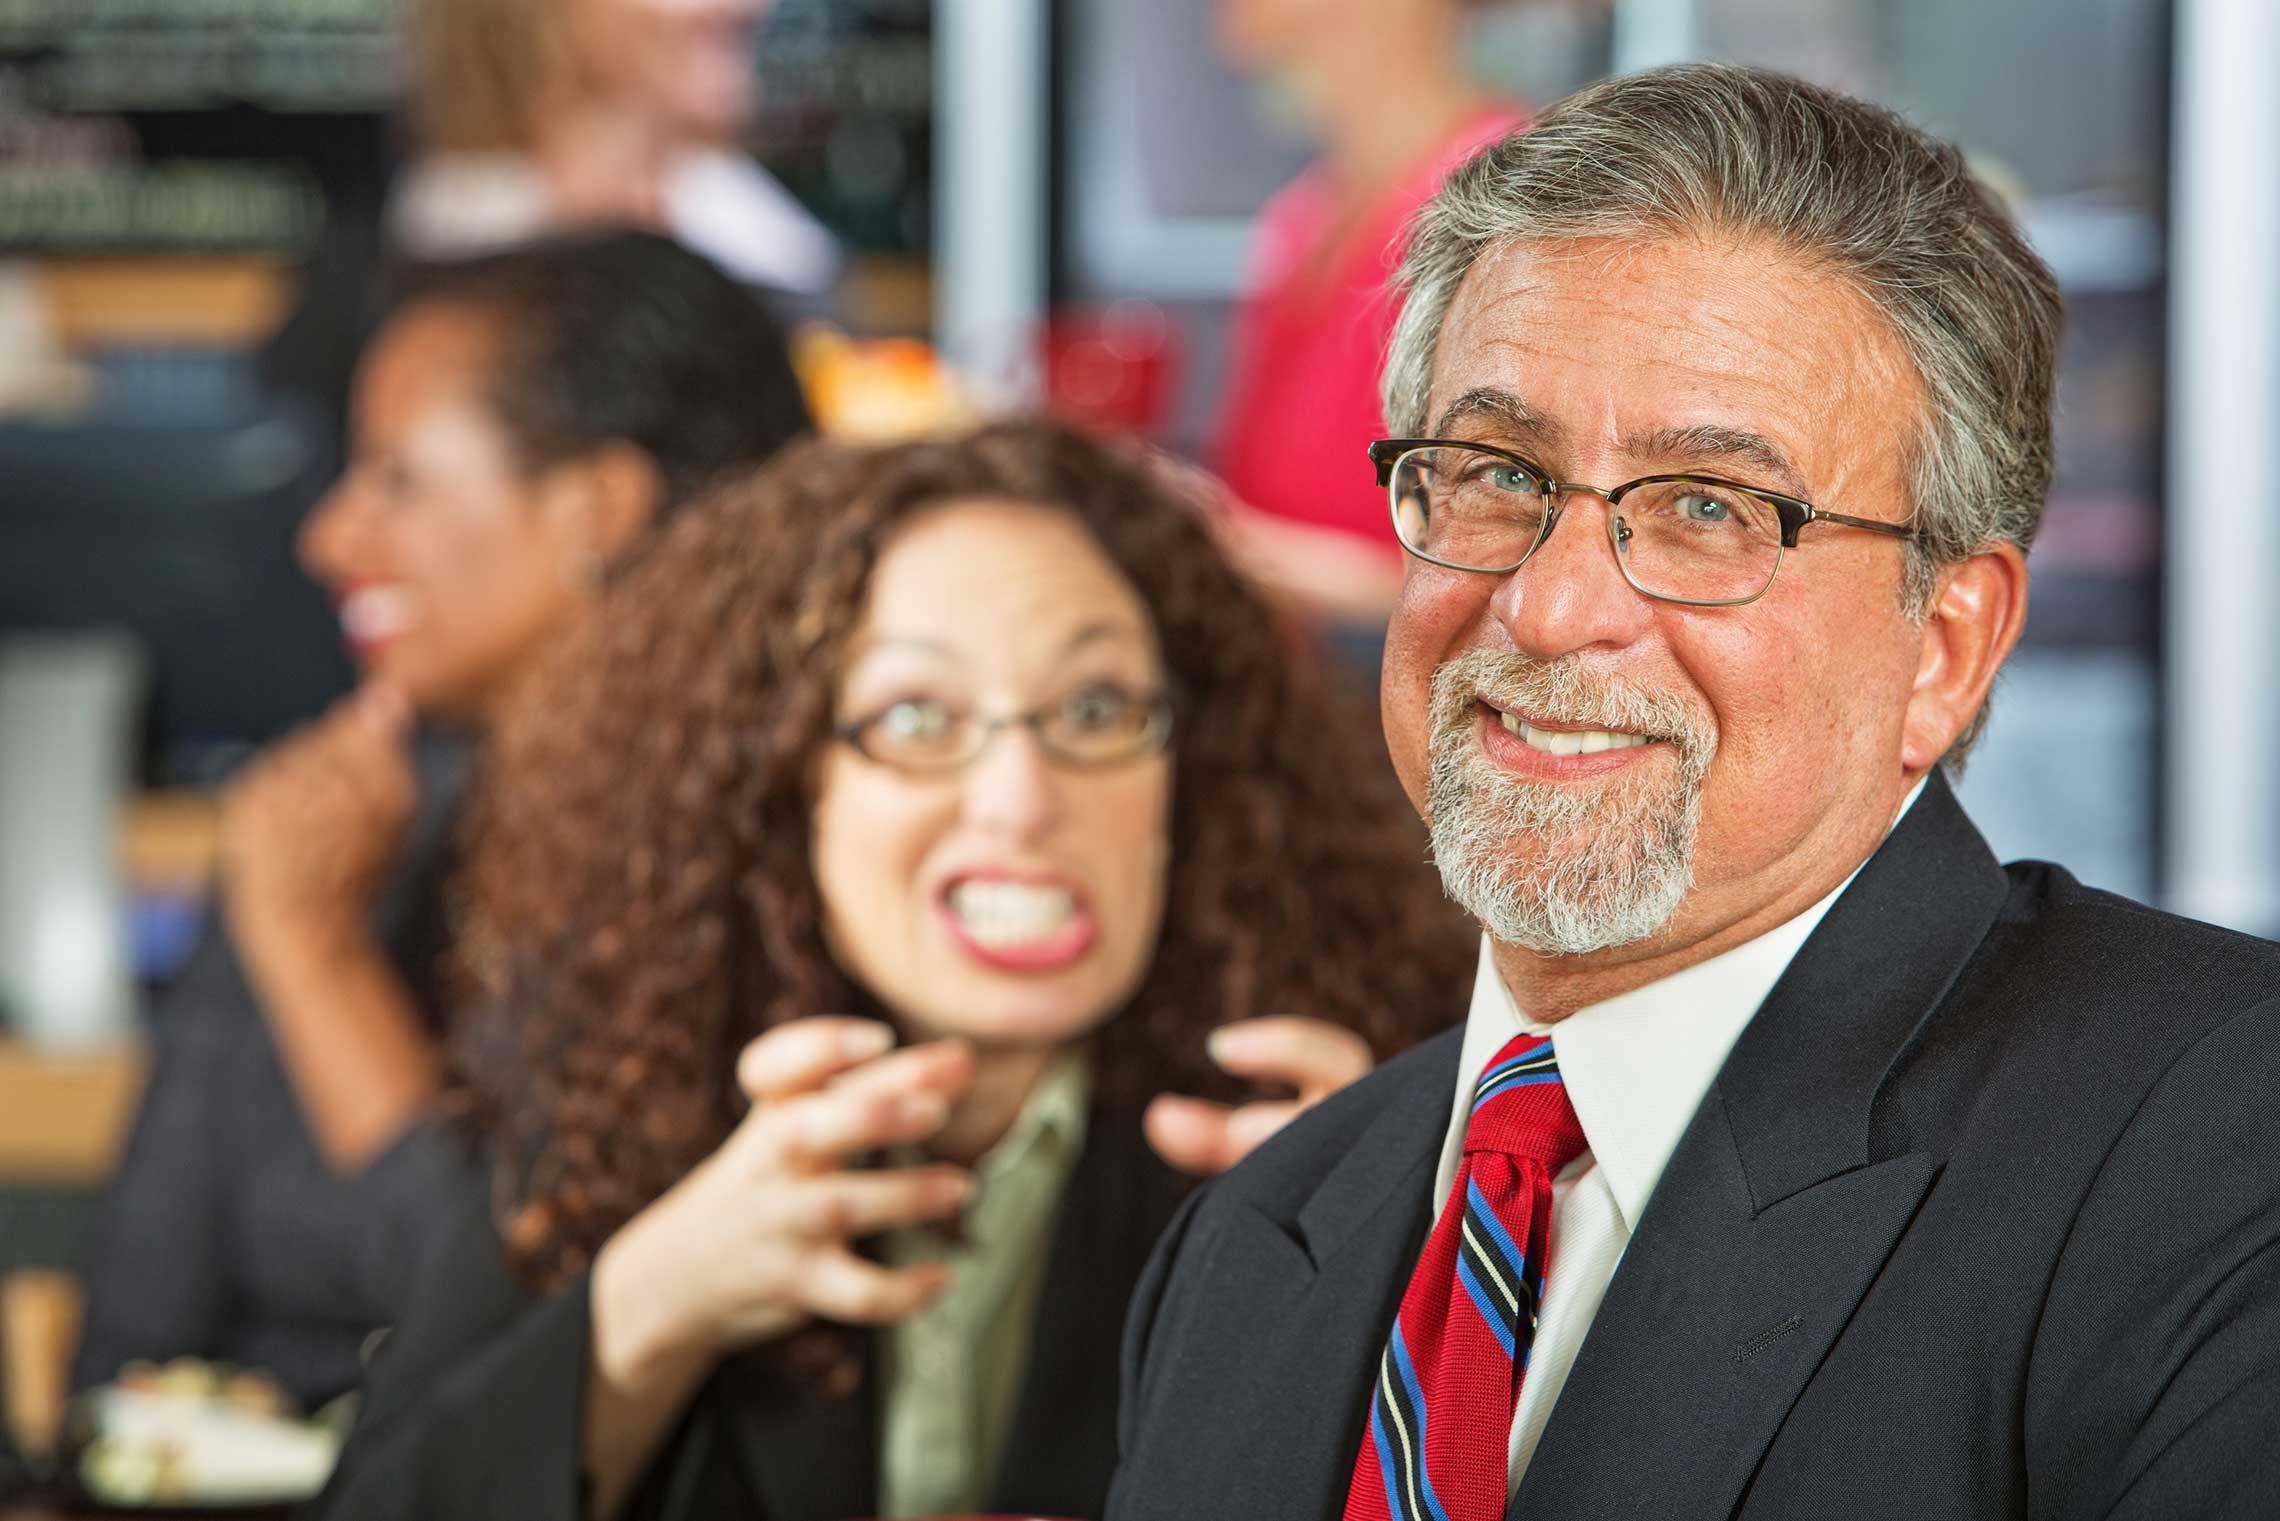 Executive Director Responsibilities: Five Ways to Avoid